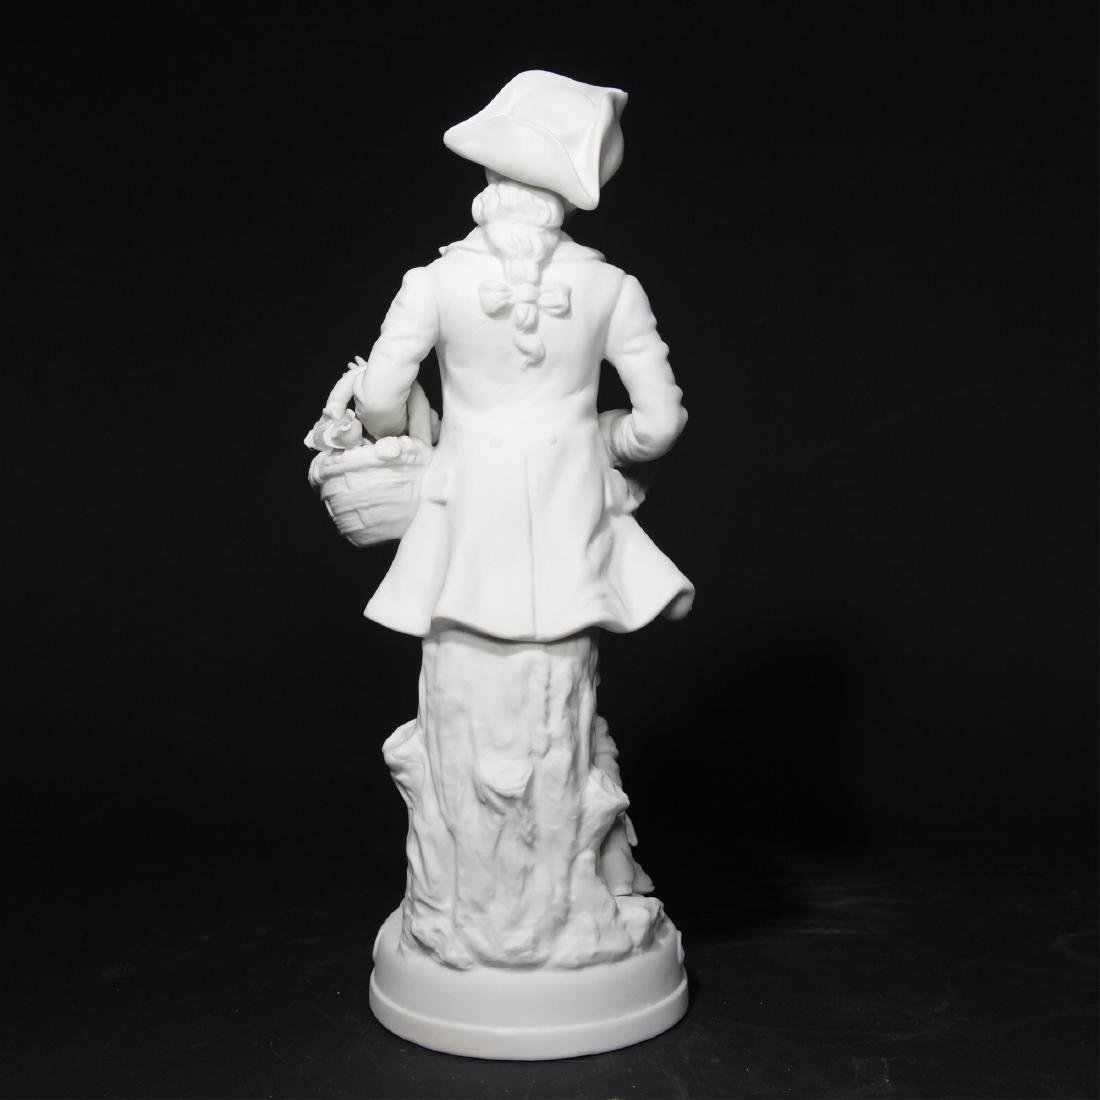 Bisque Porcelain Statue Sculptural Figurine - 2